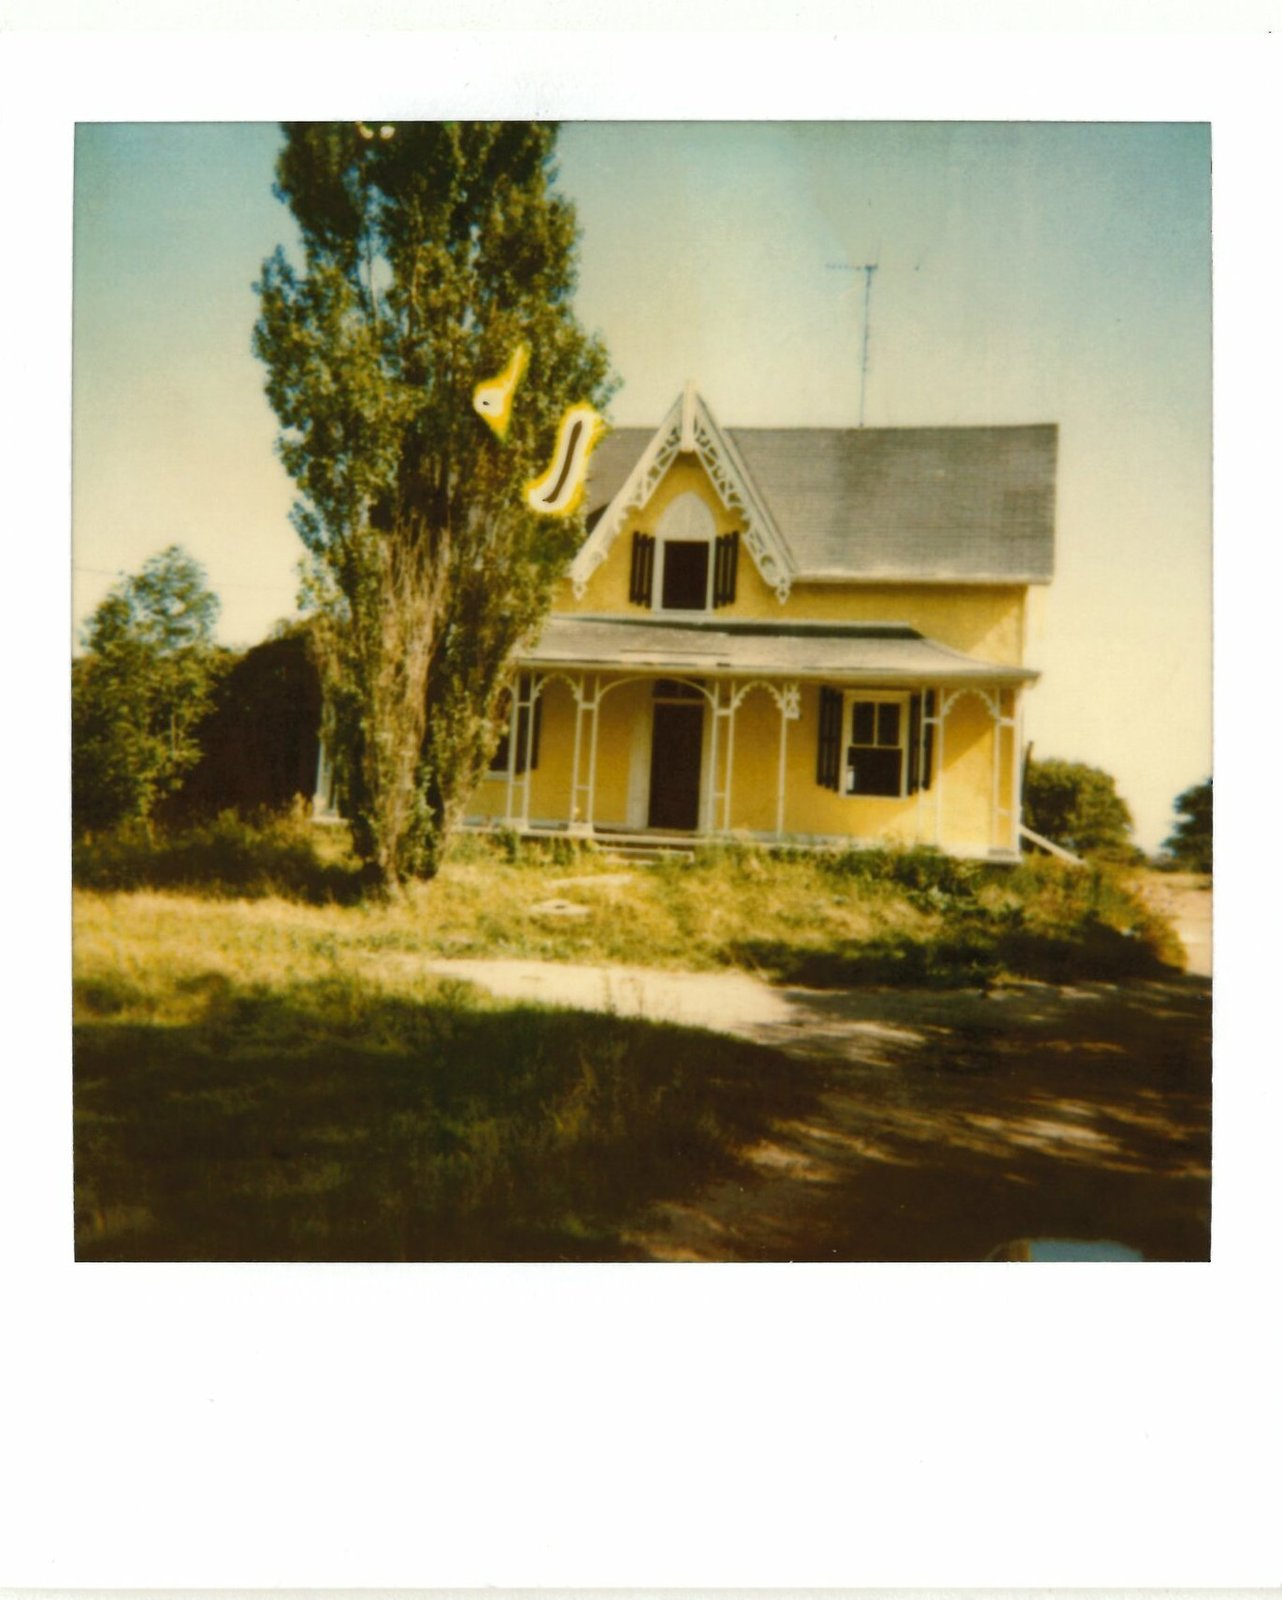 Photographs of 38 Dundas Street West, Oakville, Ontario